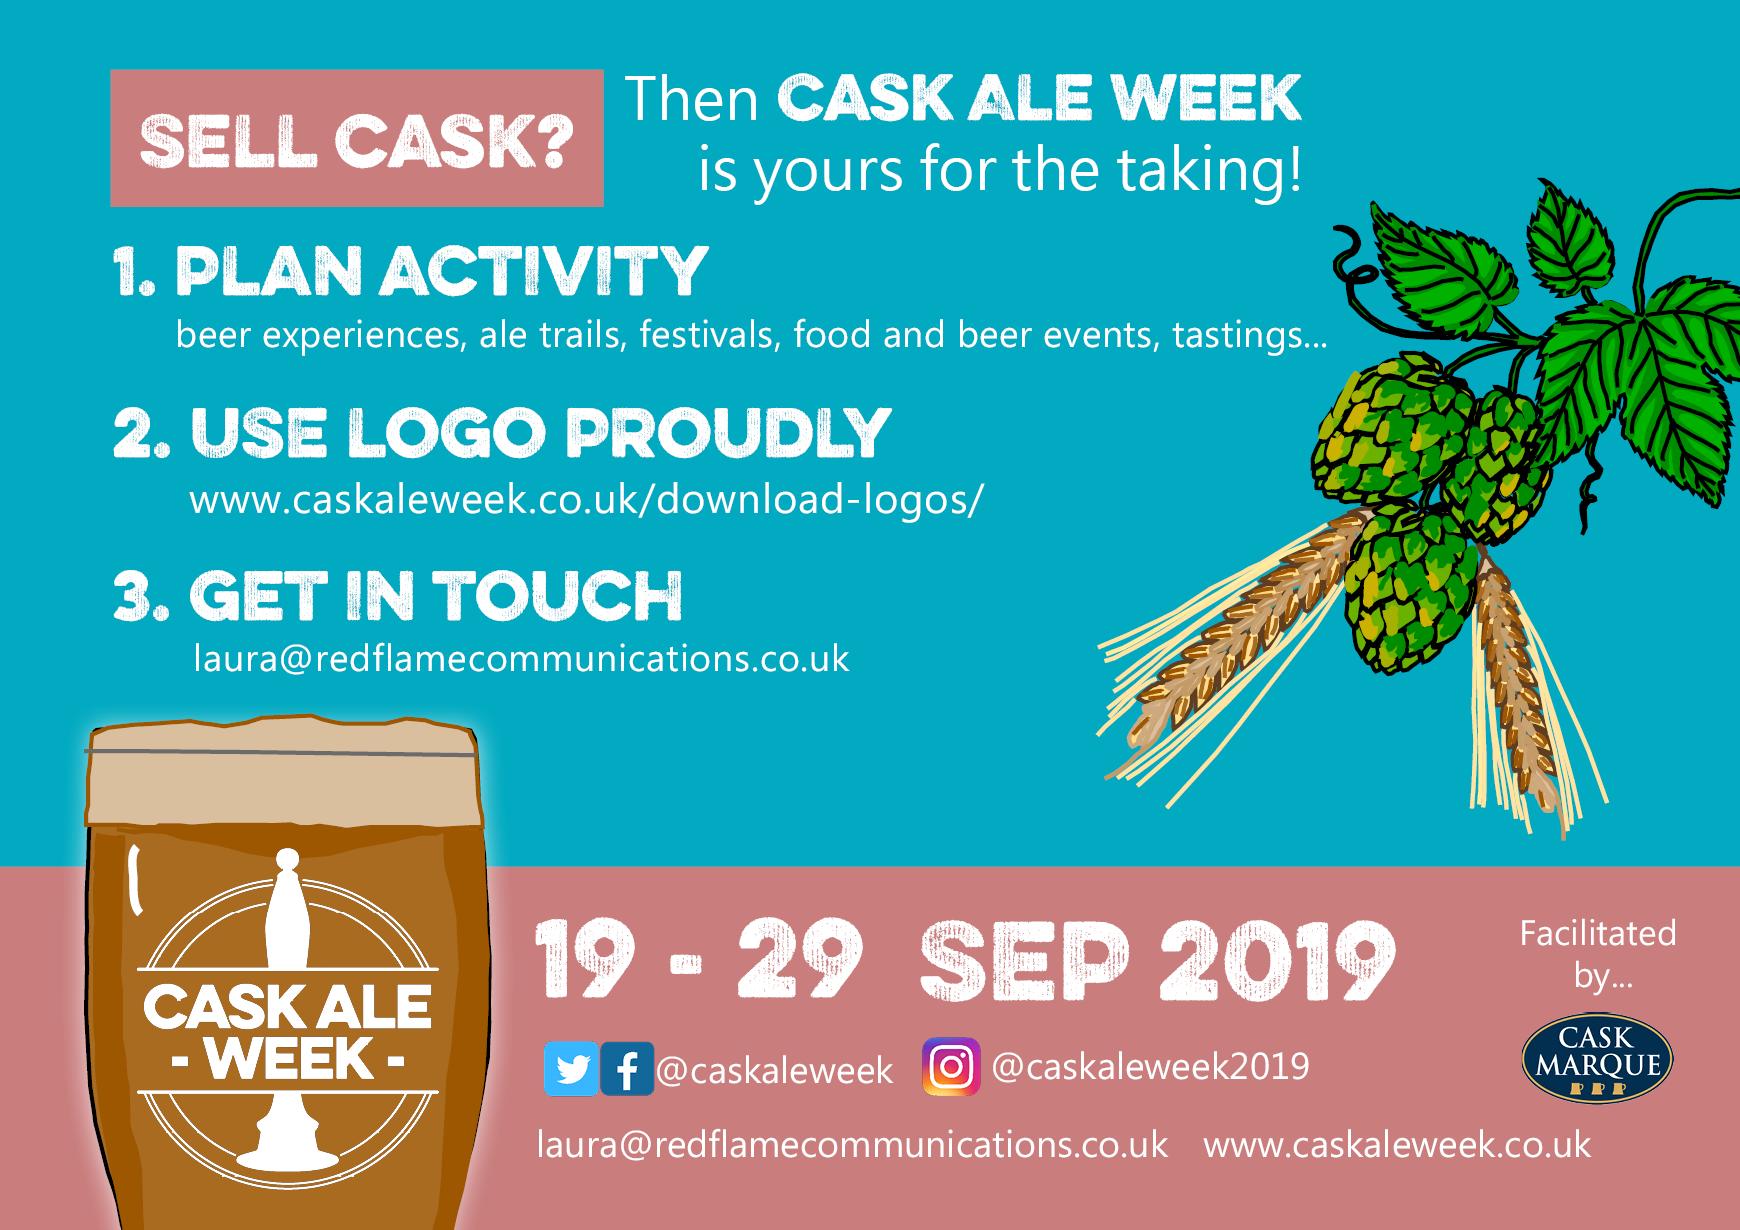 Postcard promoting Cask Ale Week 2019 (back)